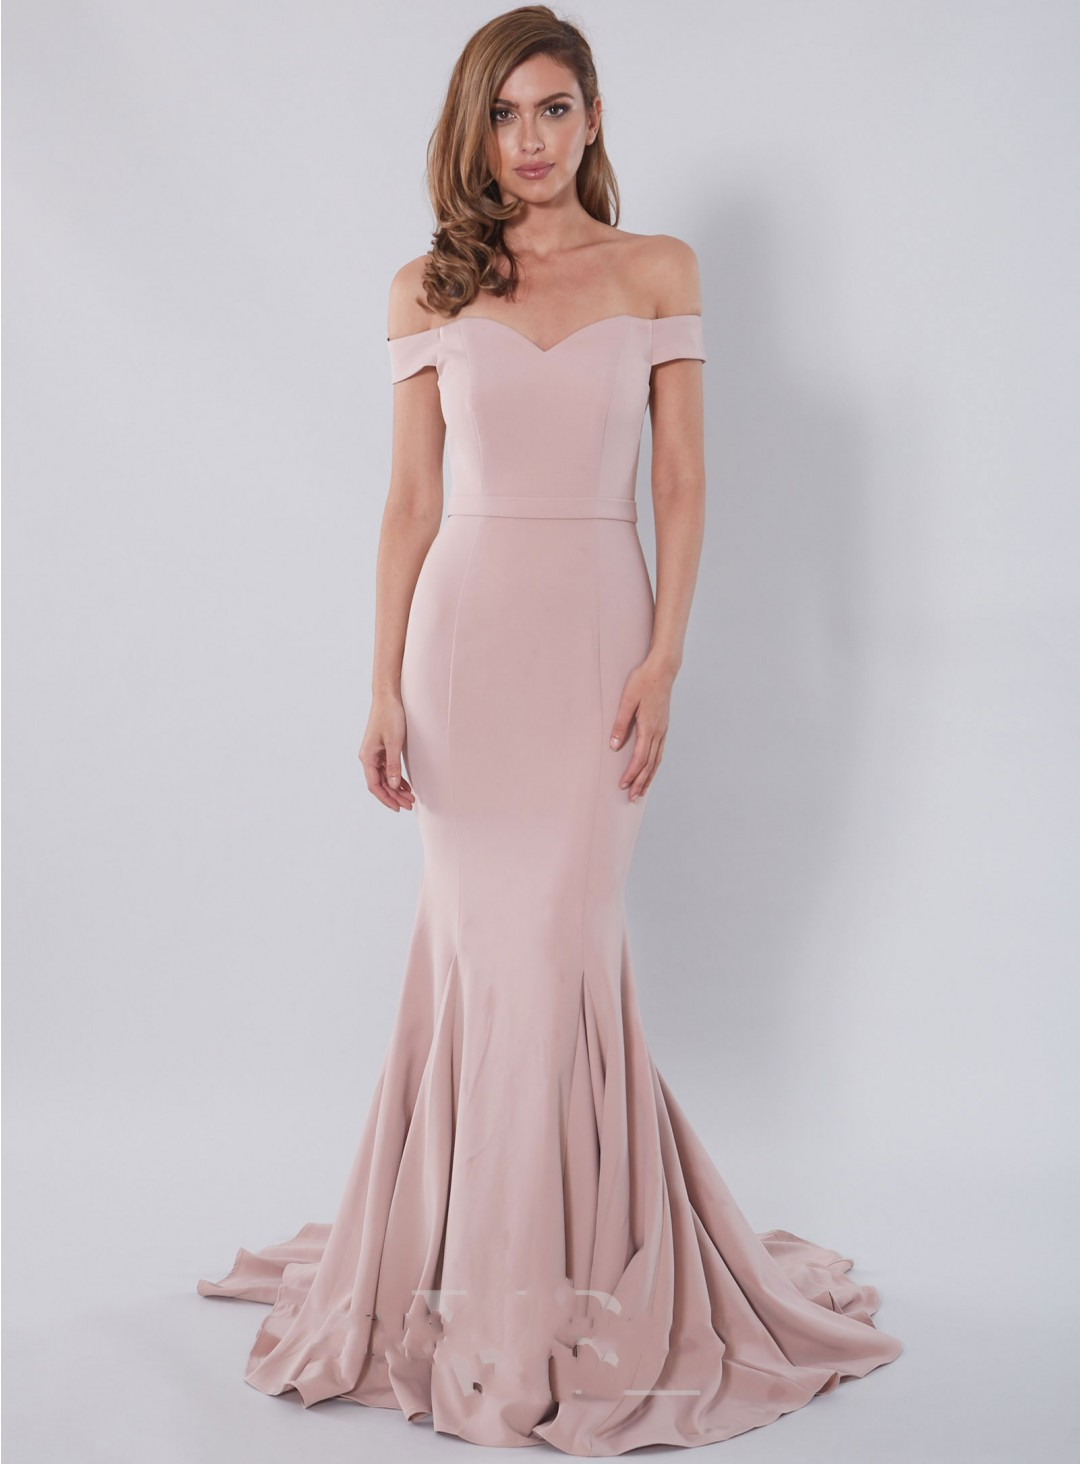 395c8e0c97 Sexy Mermaid Prom Dress